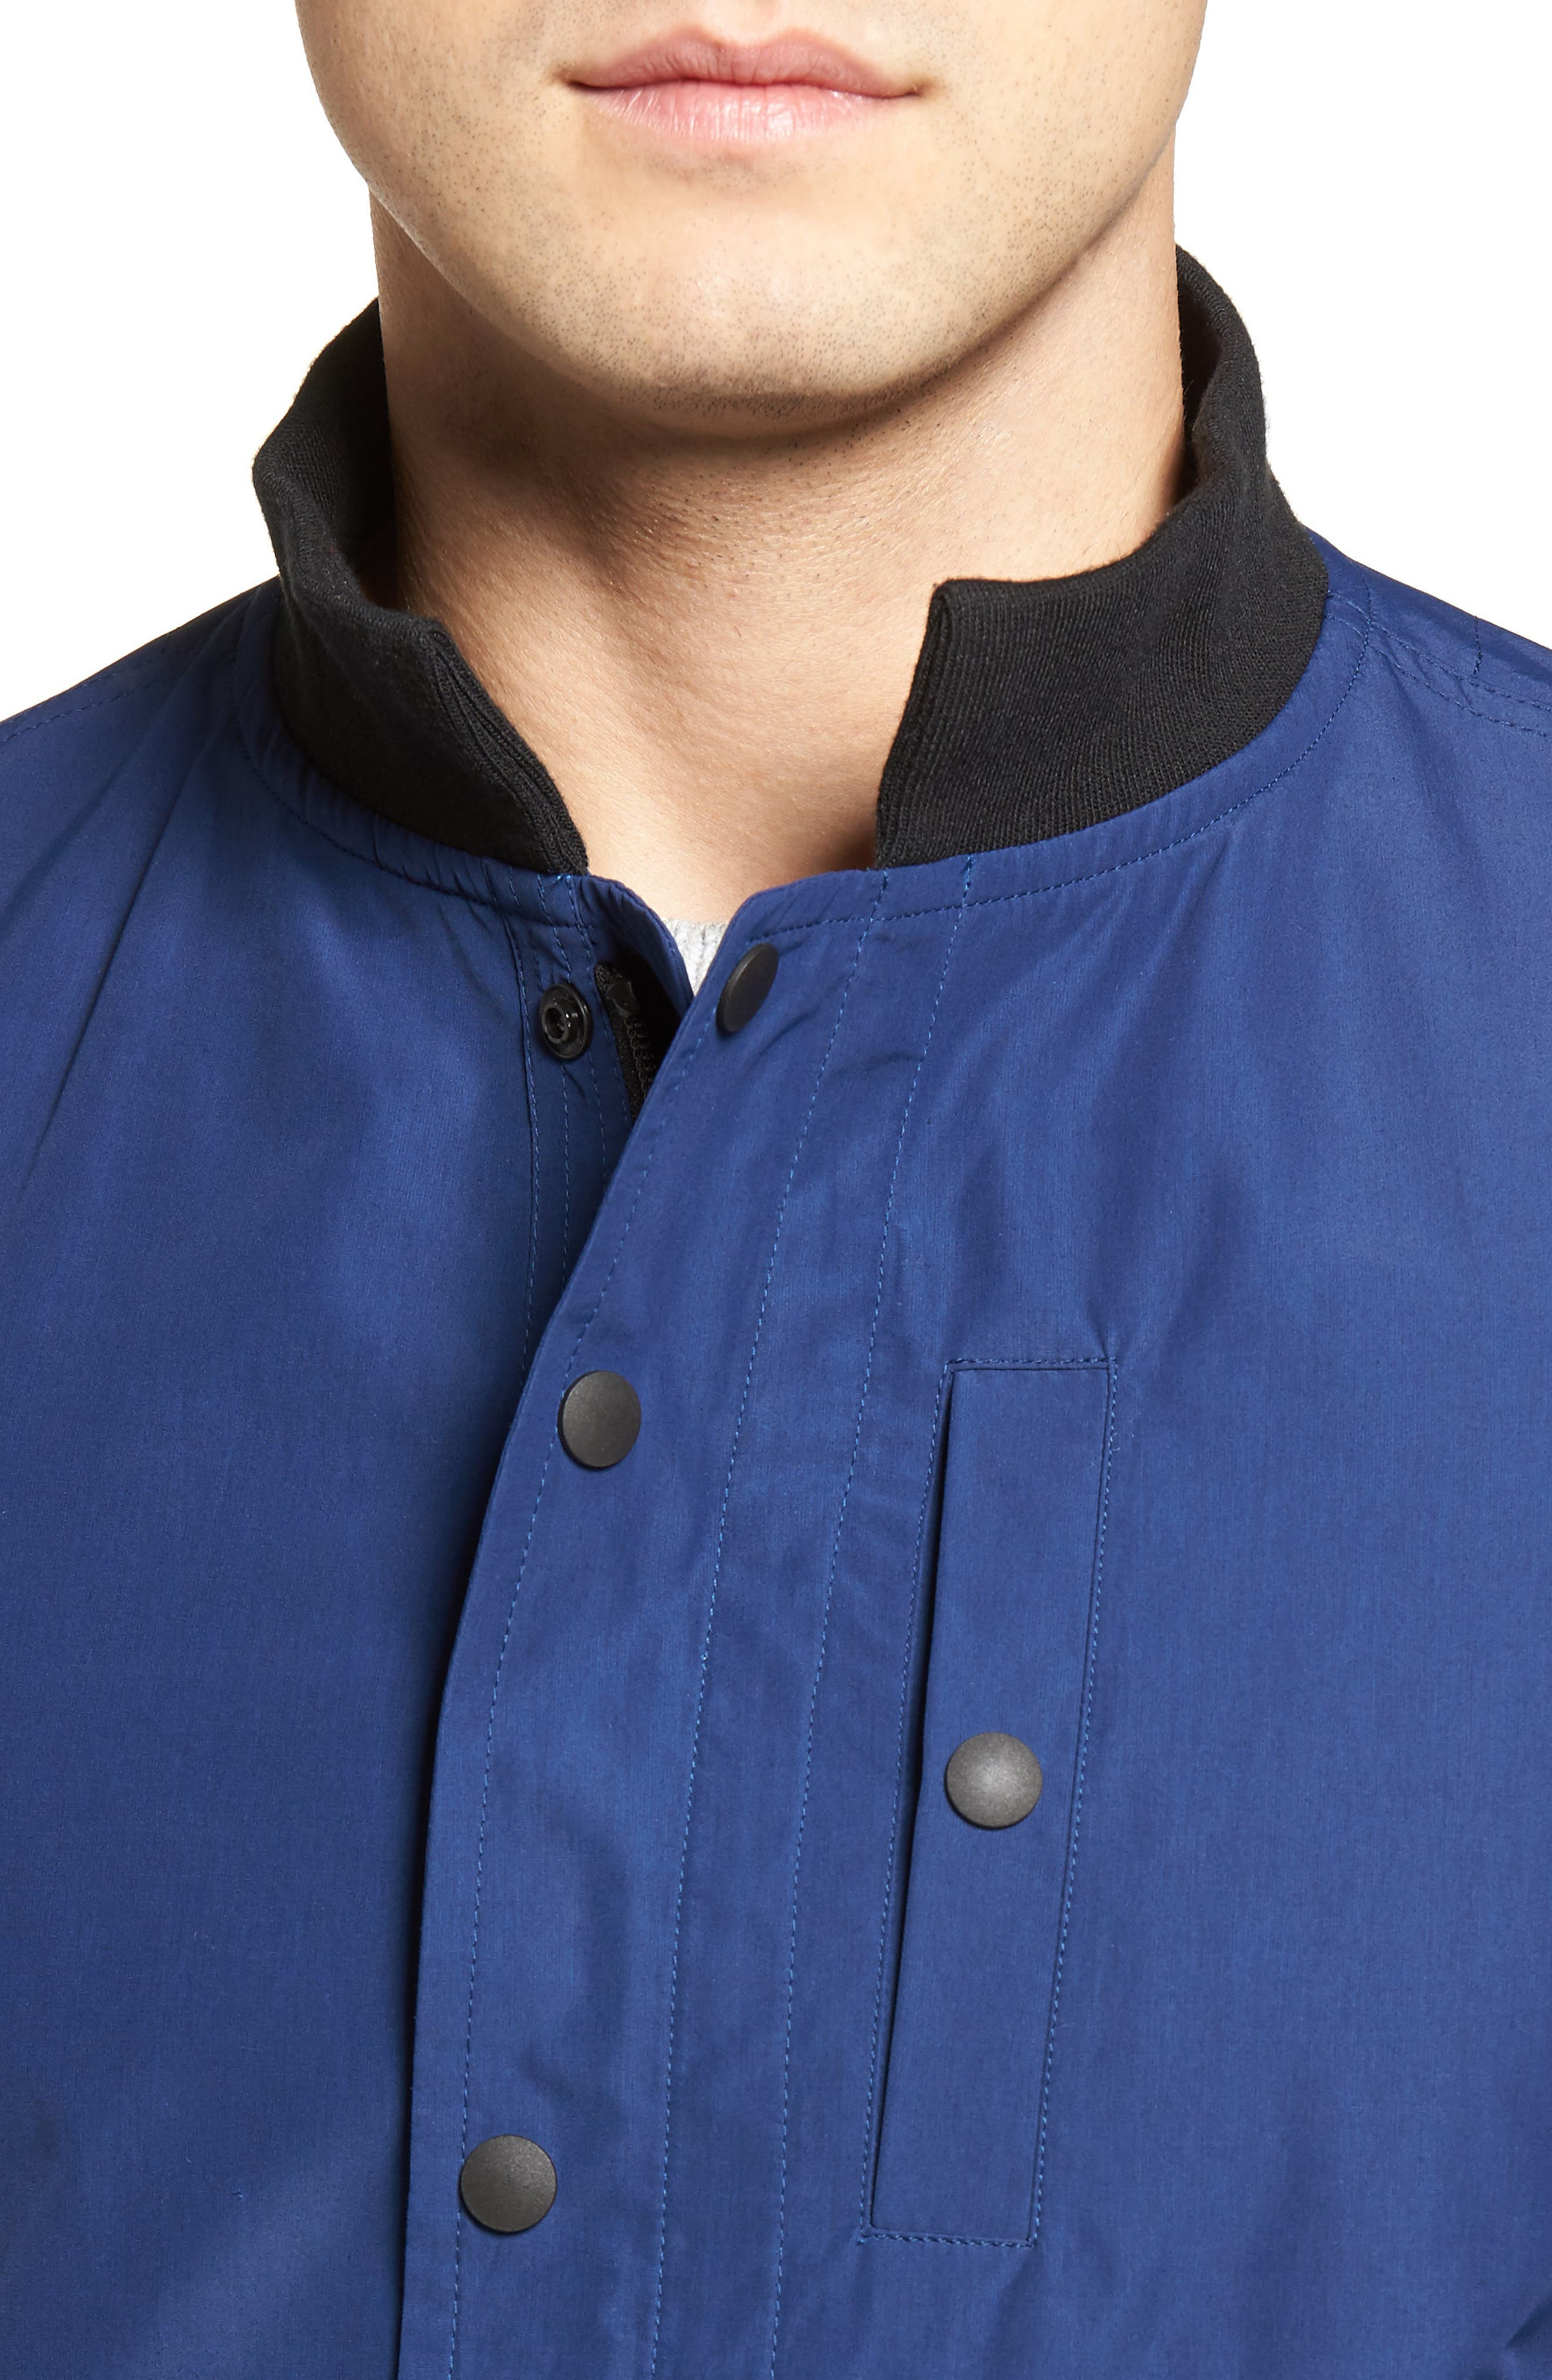 Water Repellent Jacket,                             Alternate thumbnail 8, color,